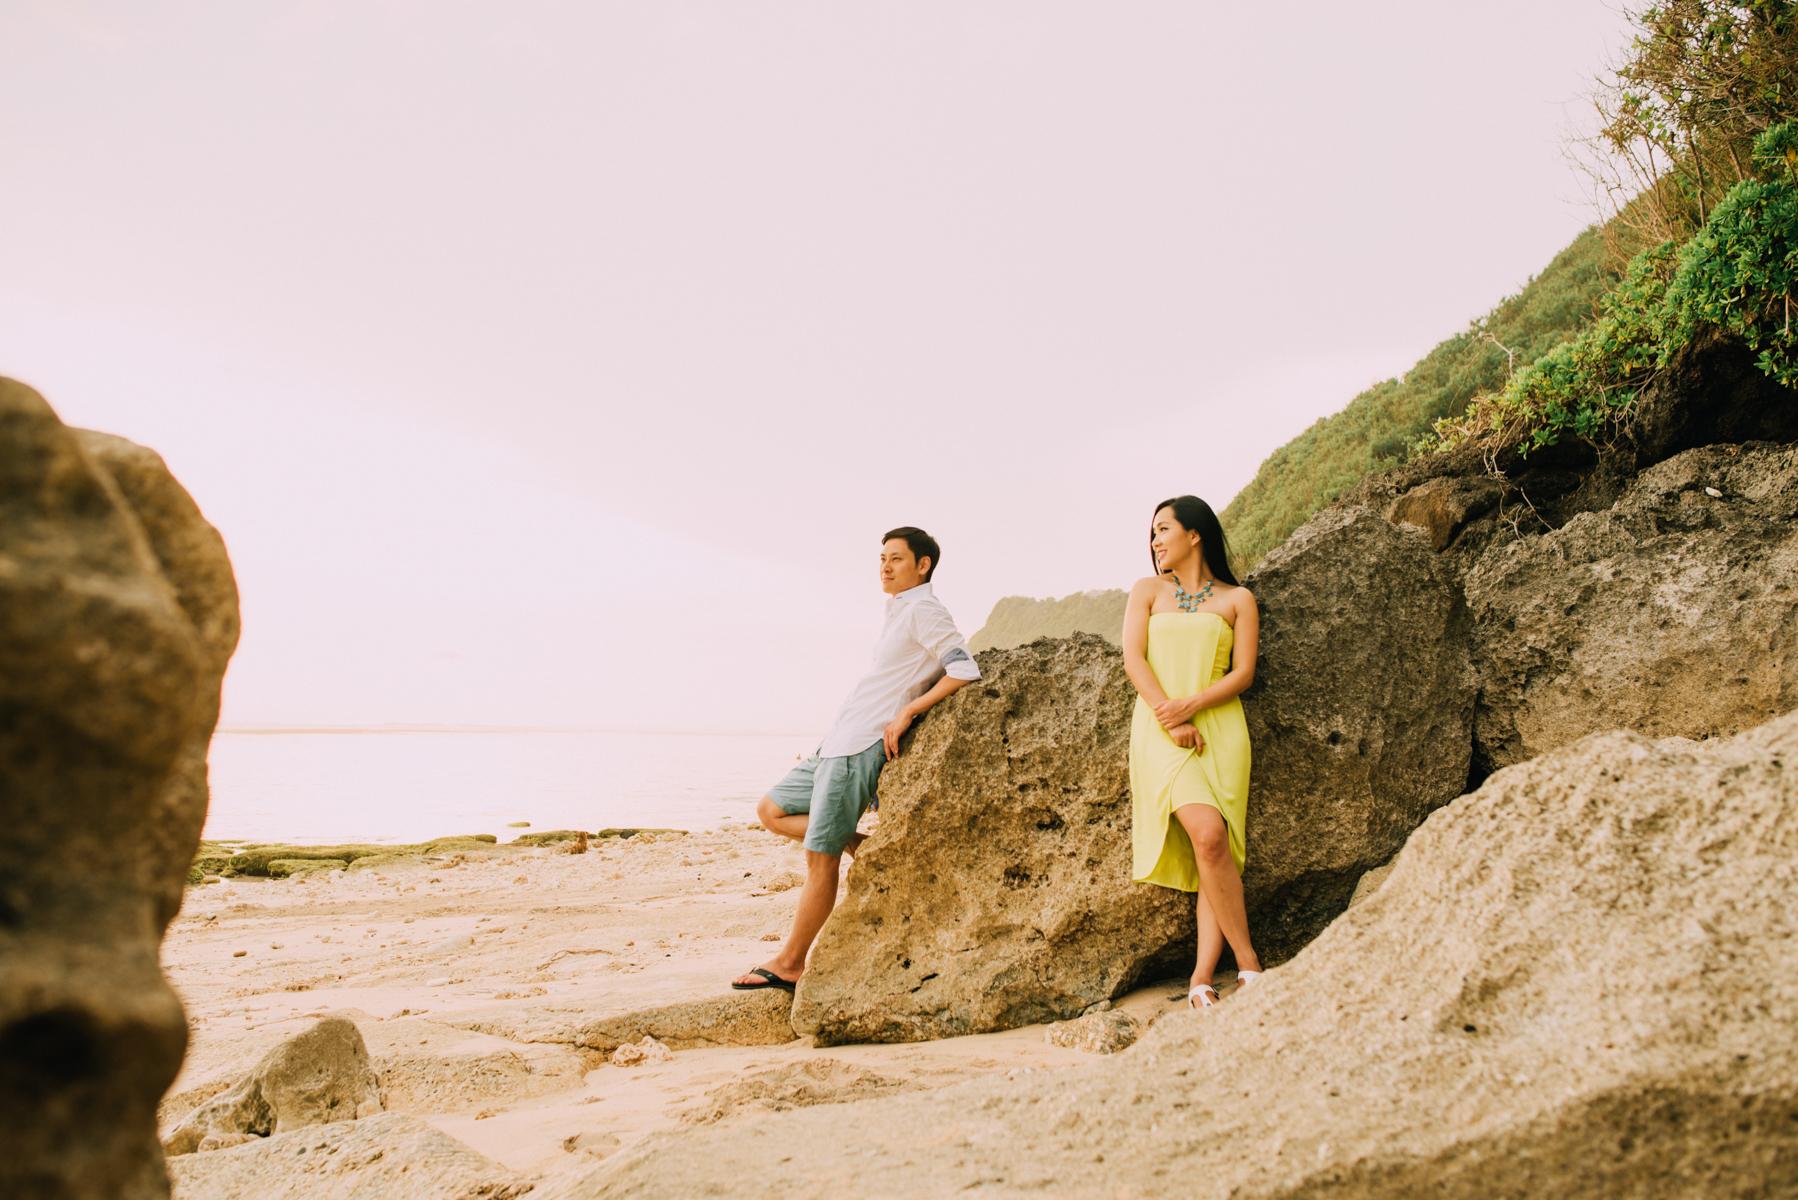 diktatphotography-baliweddingphotography-preweddinginbali-danautamblingan-uluwatu-30